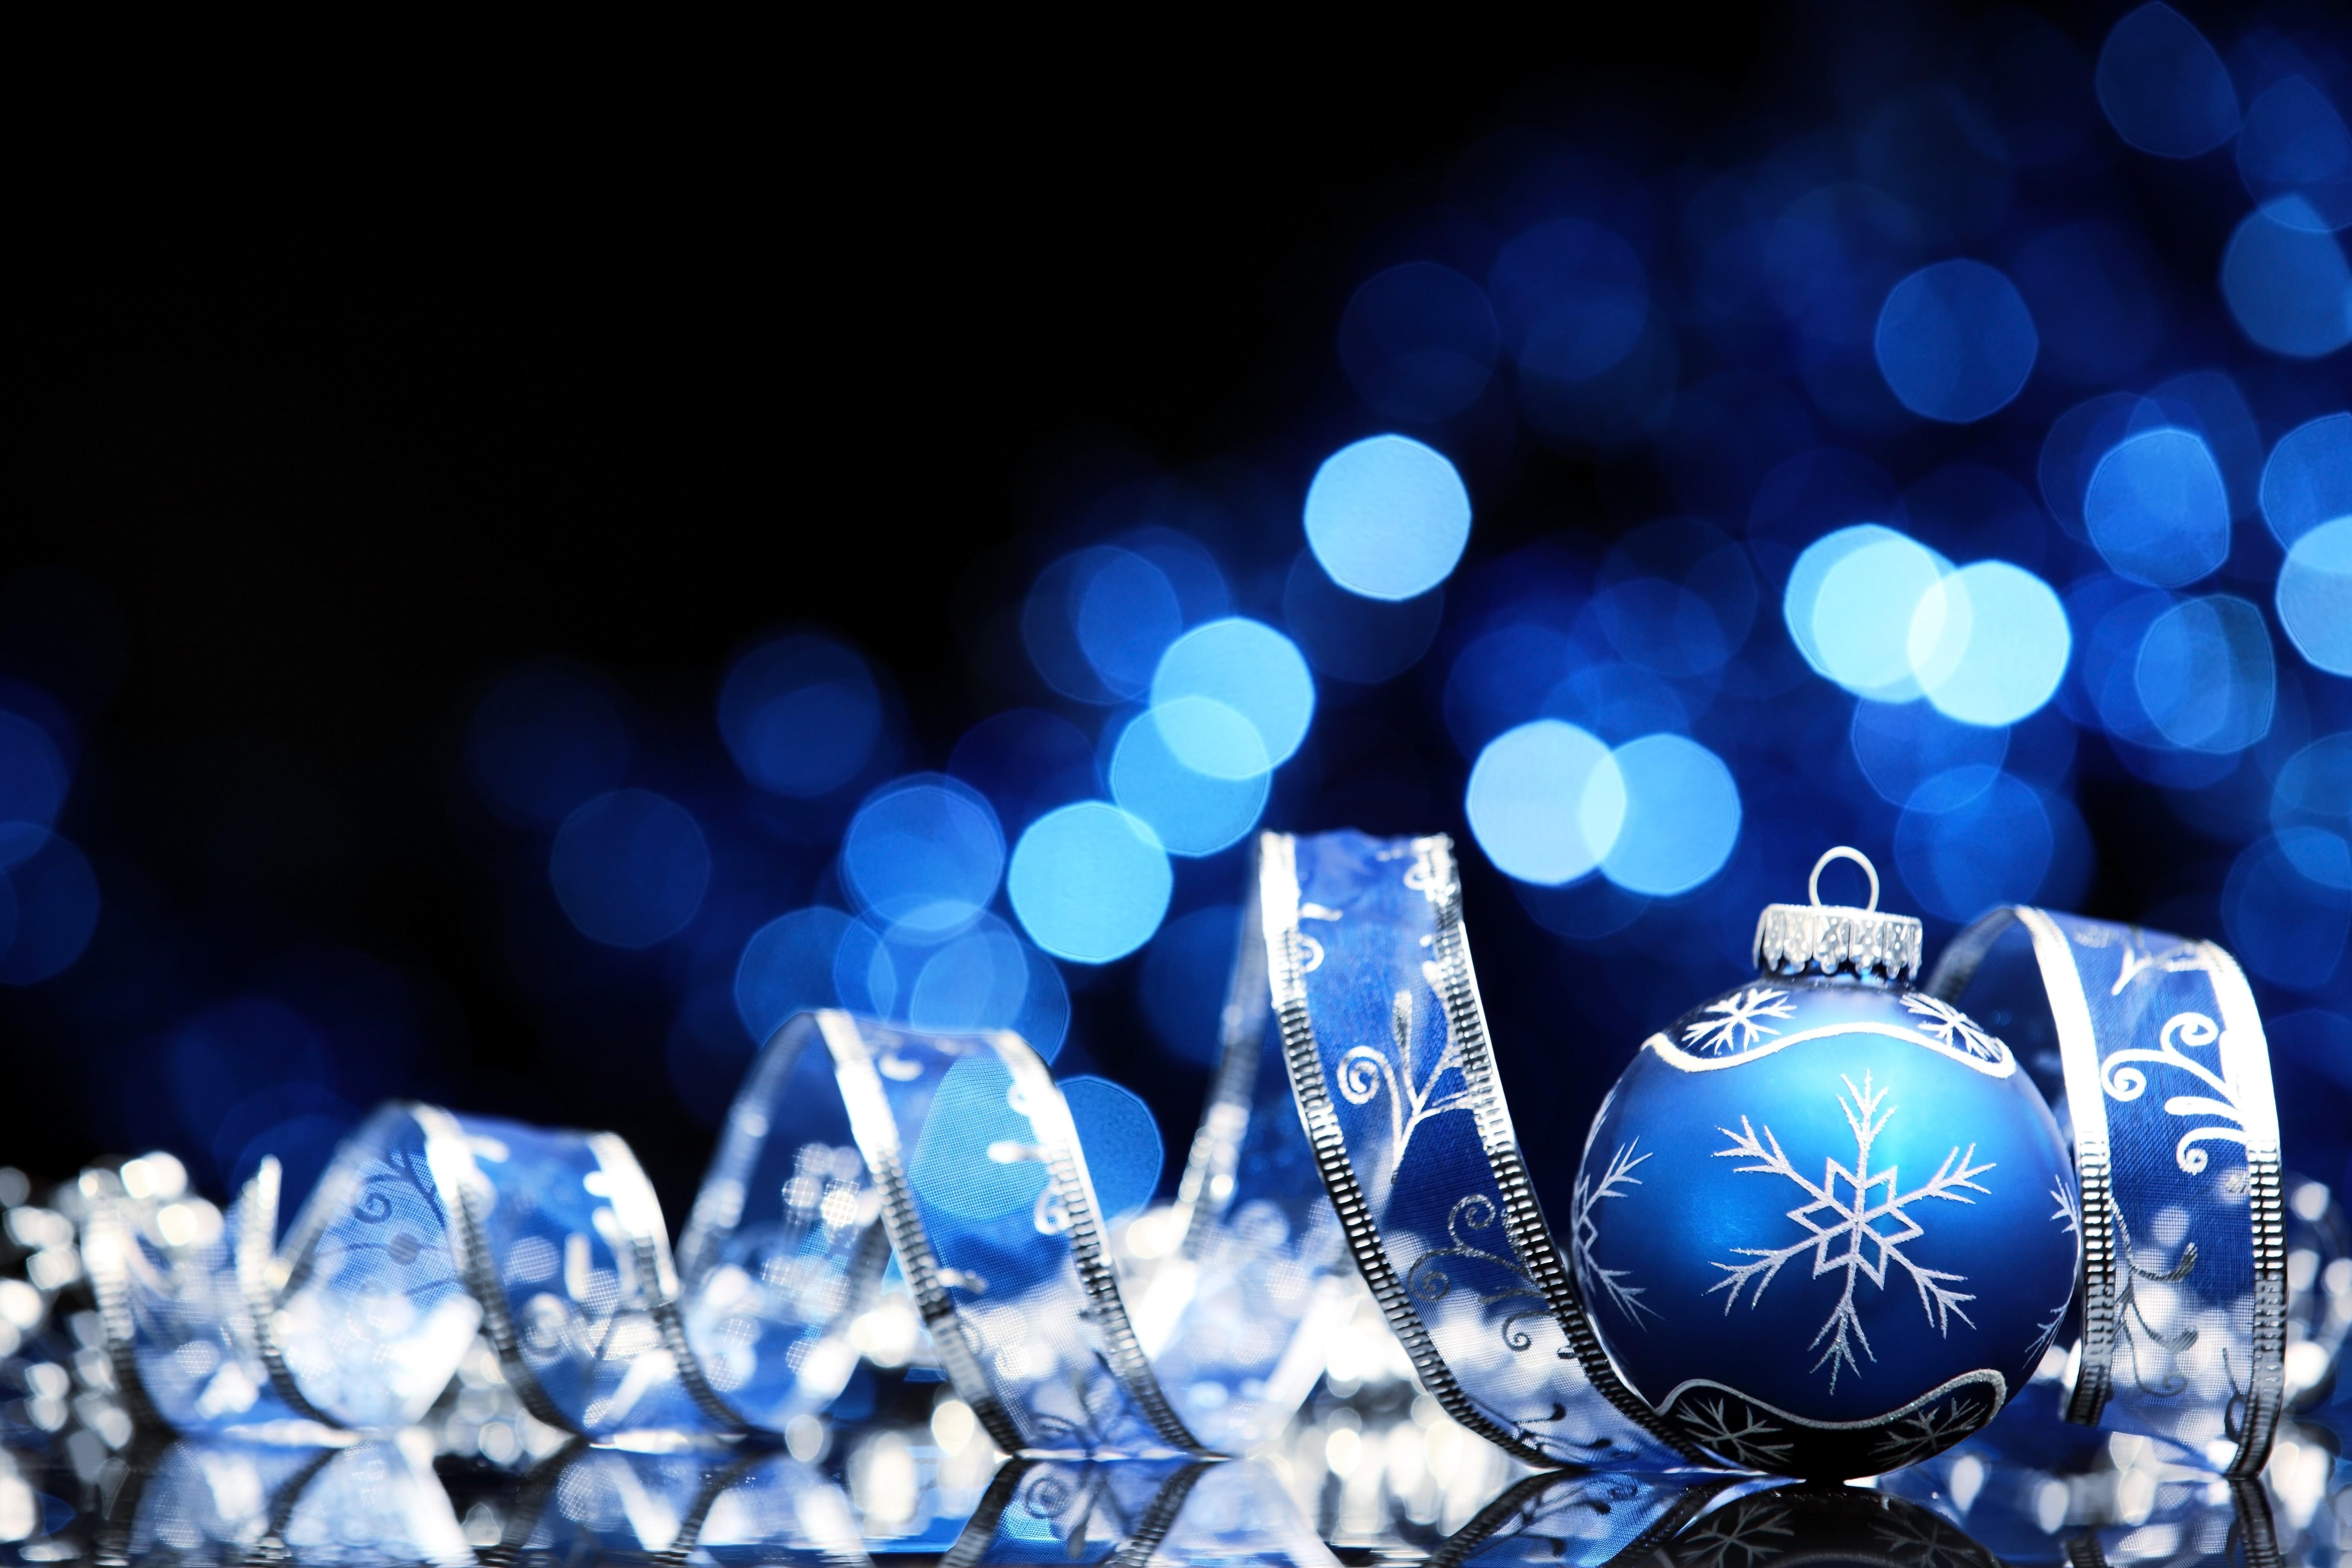 Wallpaper : night blue christmas ornaments christmas lights